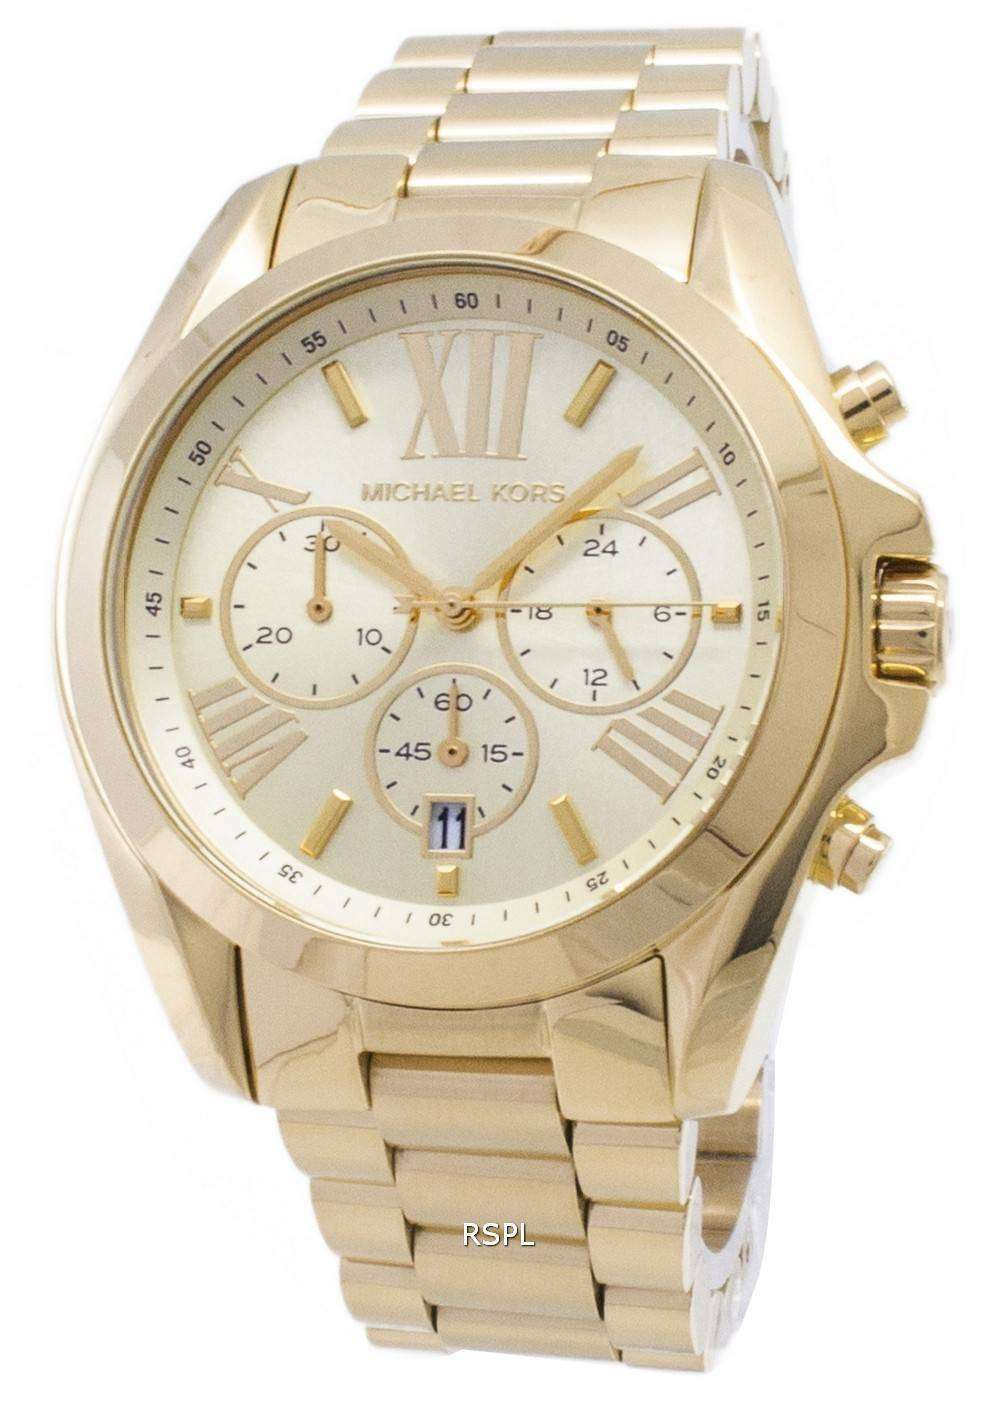 0aa5ddcc7b39 Michael Kors Bradshaw Chronograph Gold-Tone MK5605 Unisex Watch ...